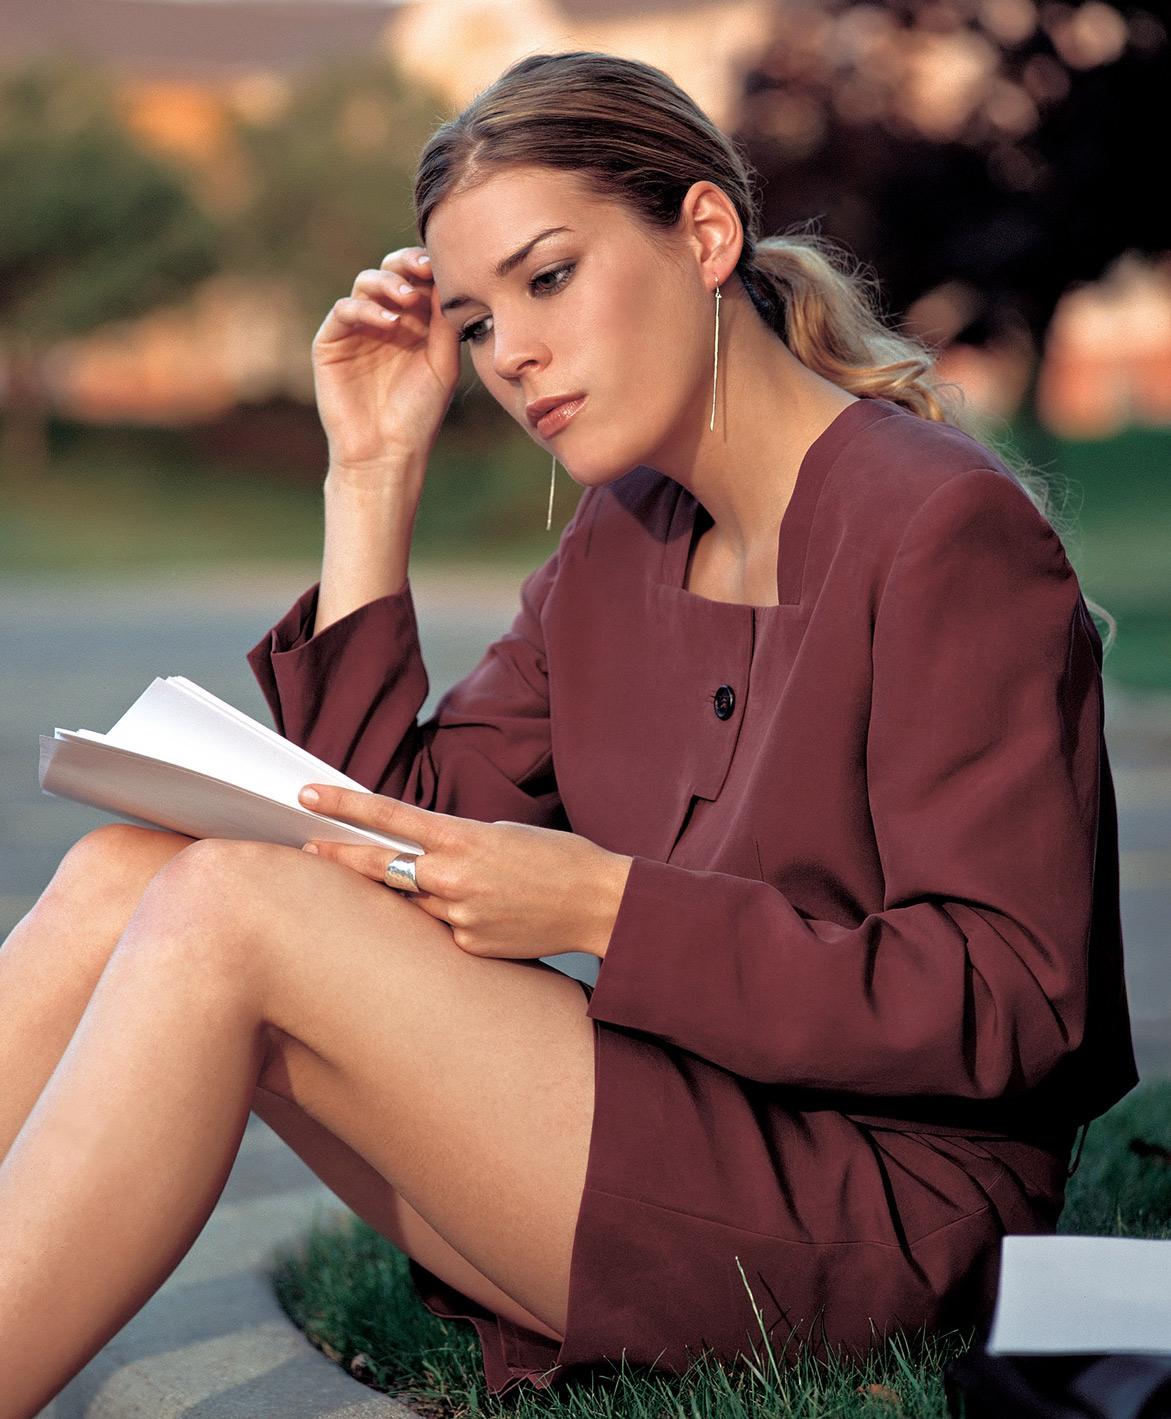 fashion catalog photography of professional model